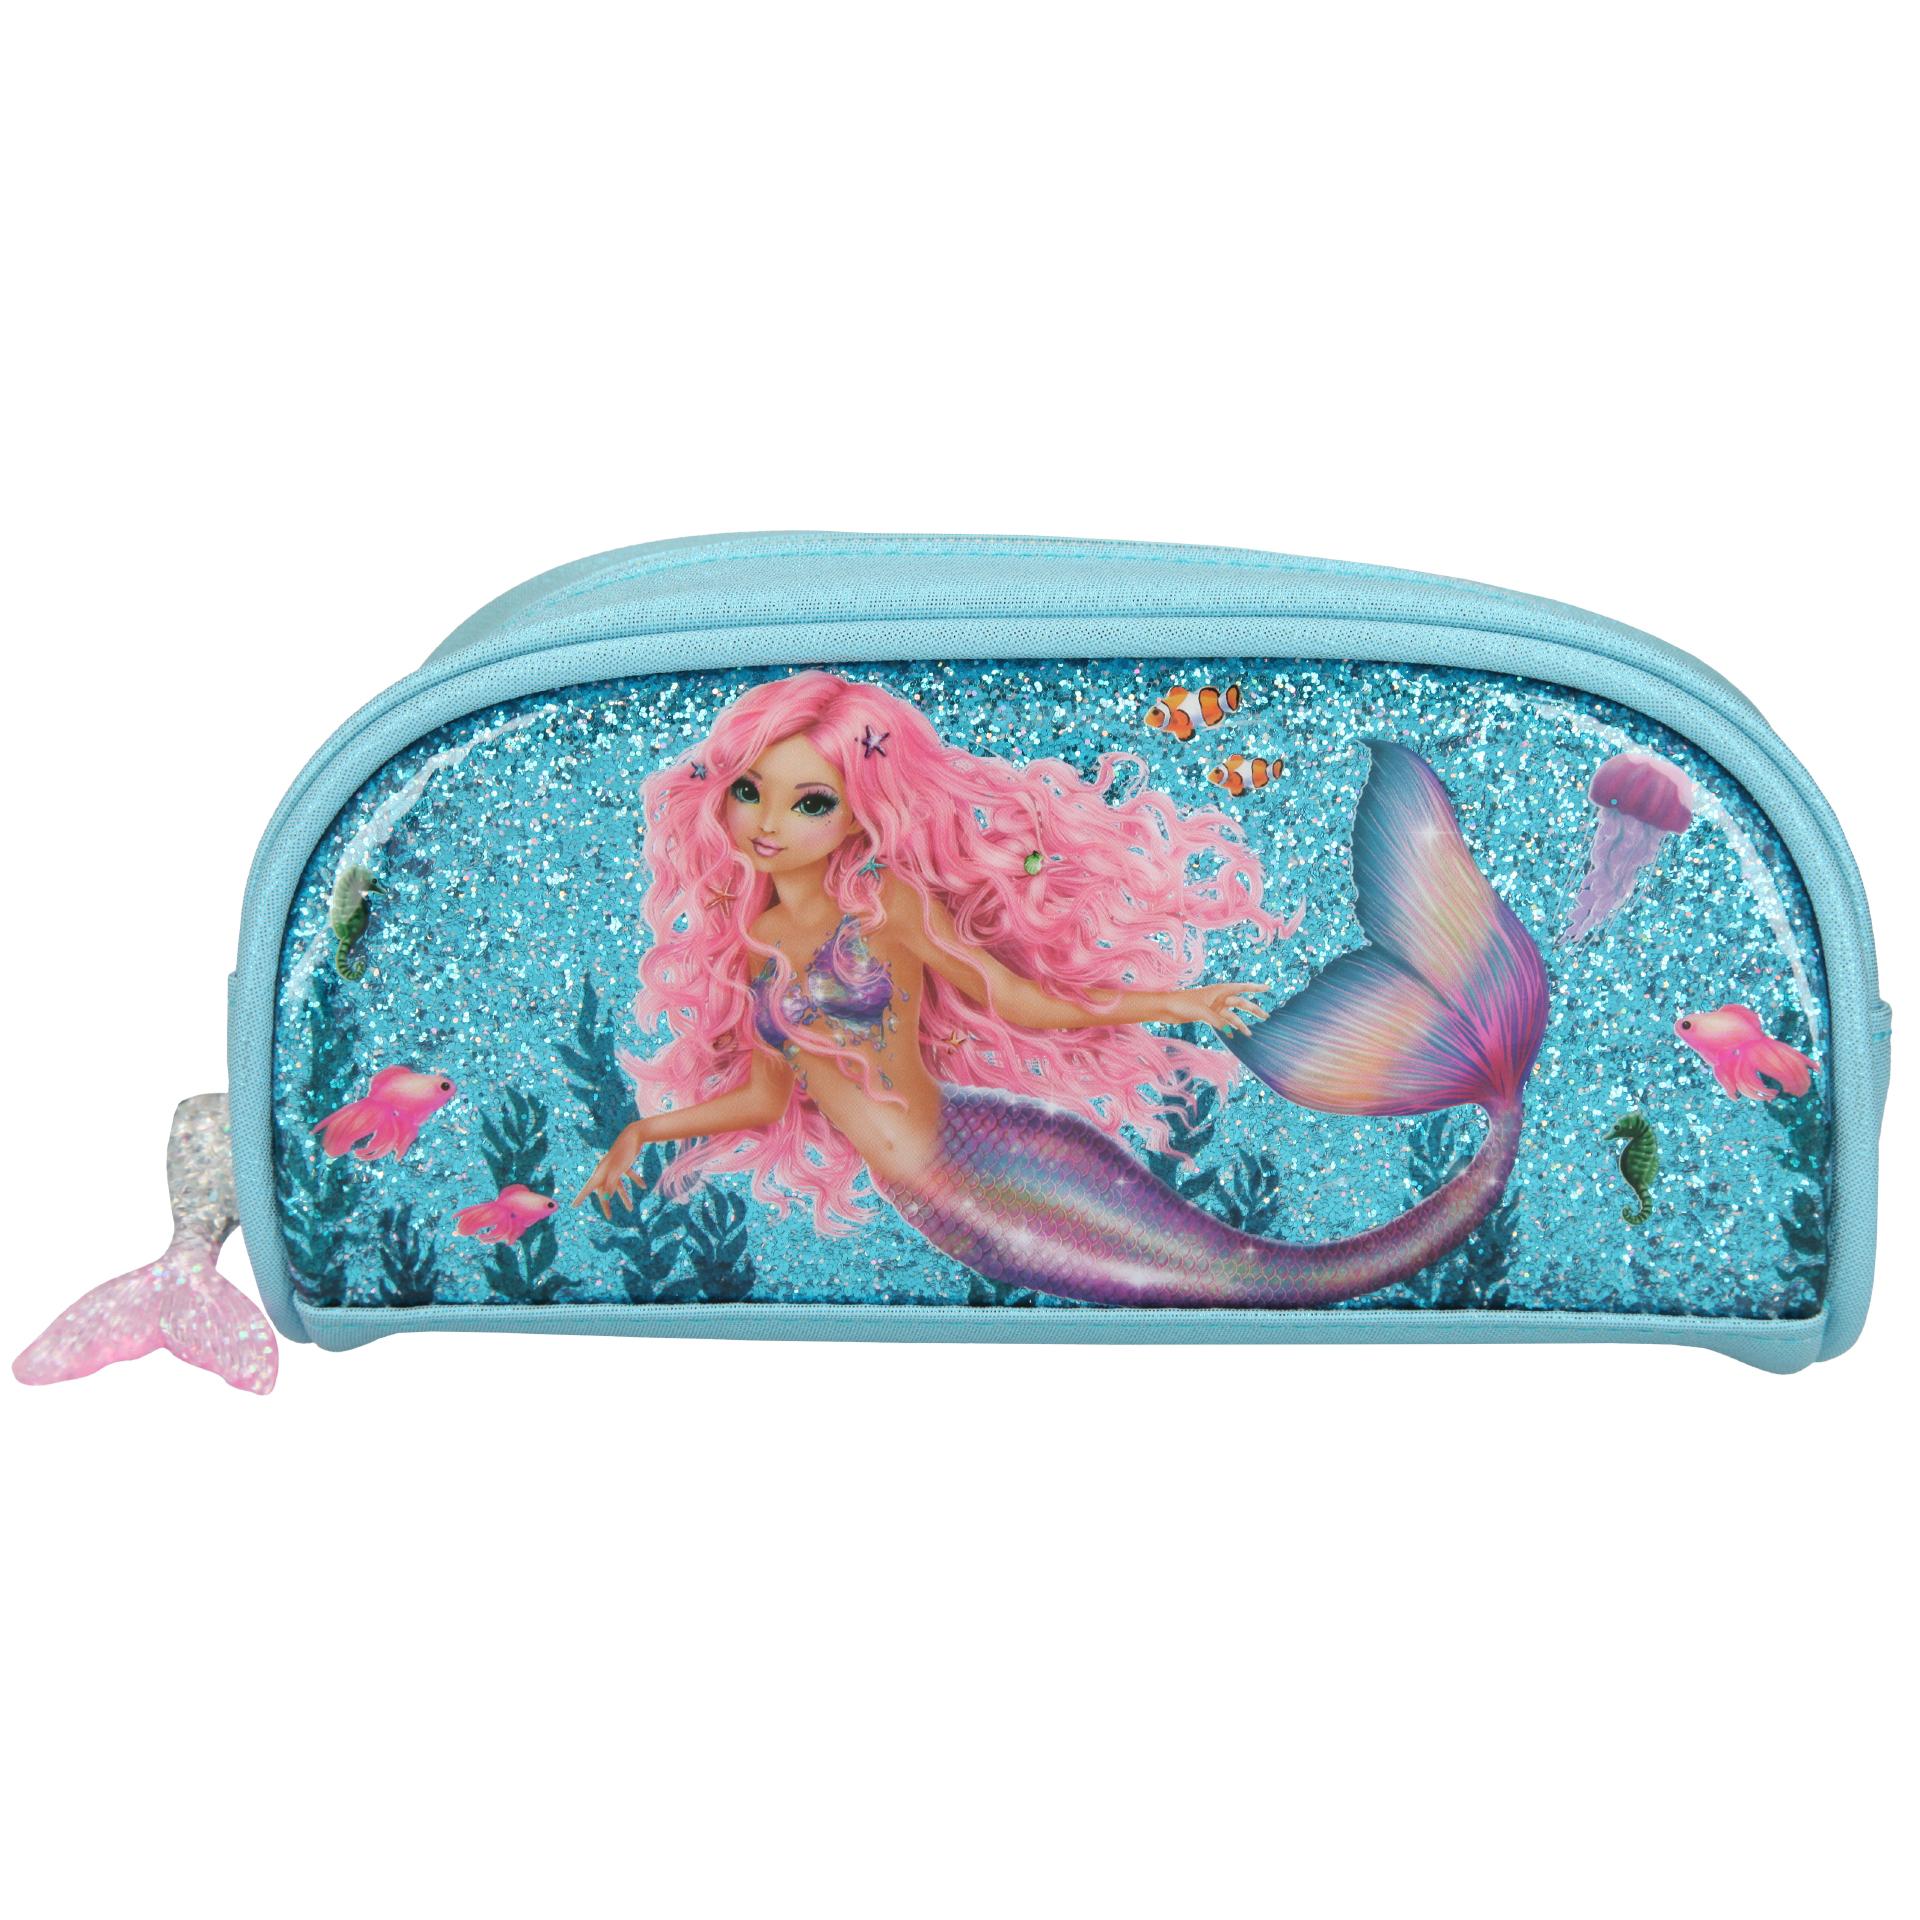 Fantasy Model penalhus, Mermaid